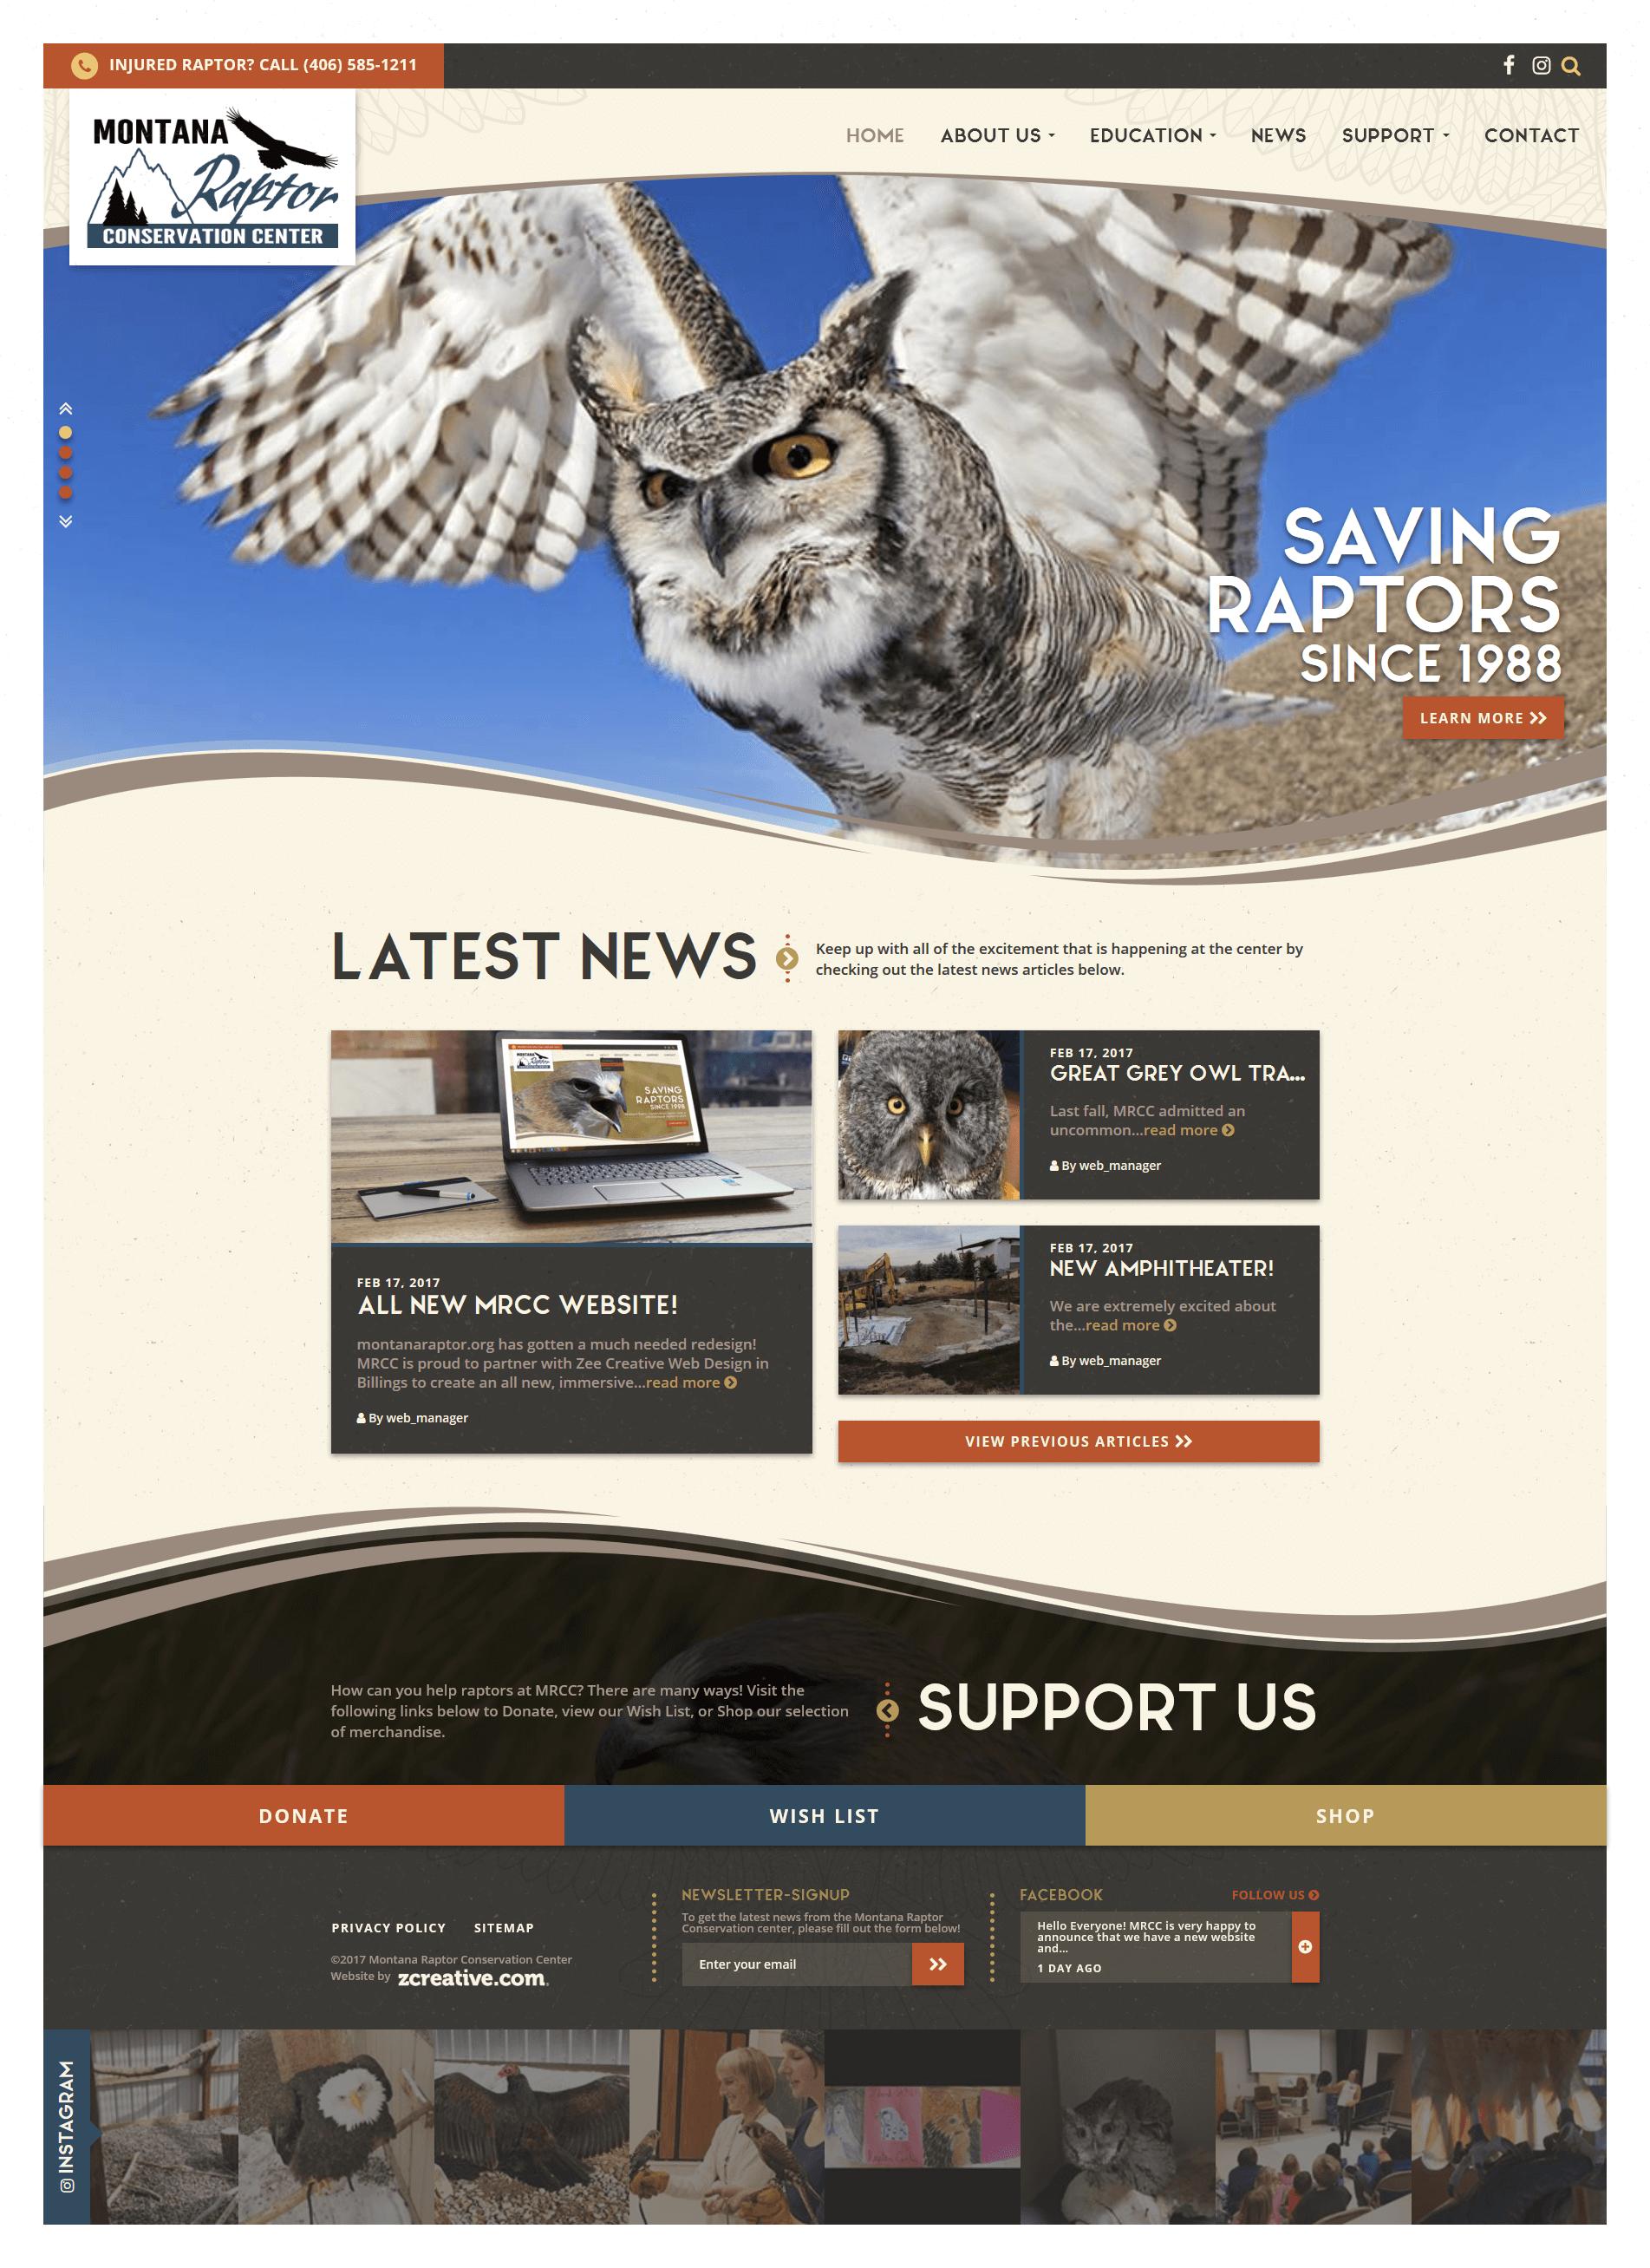 Montana Raptor Conservation Center Wordpress Website Design Creative Web Design Conservation